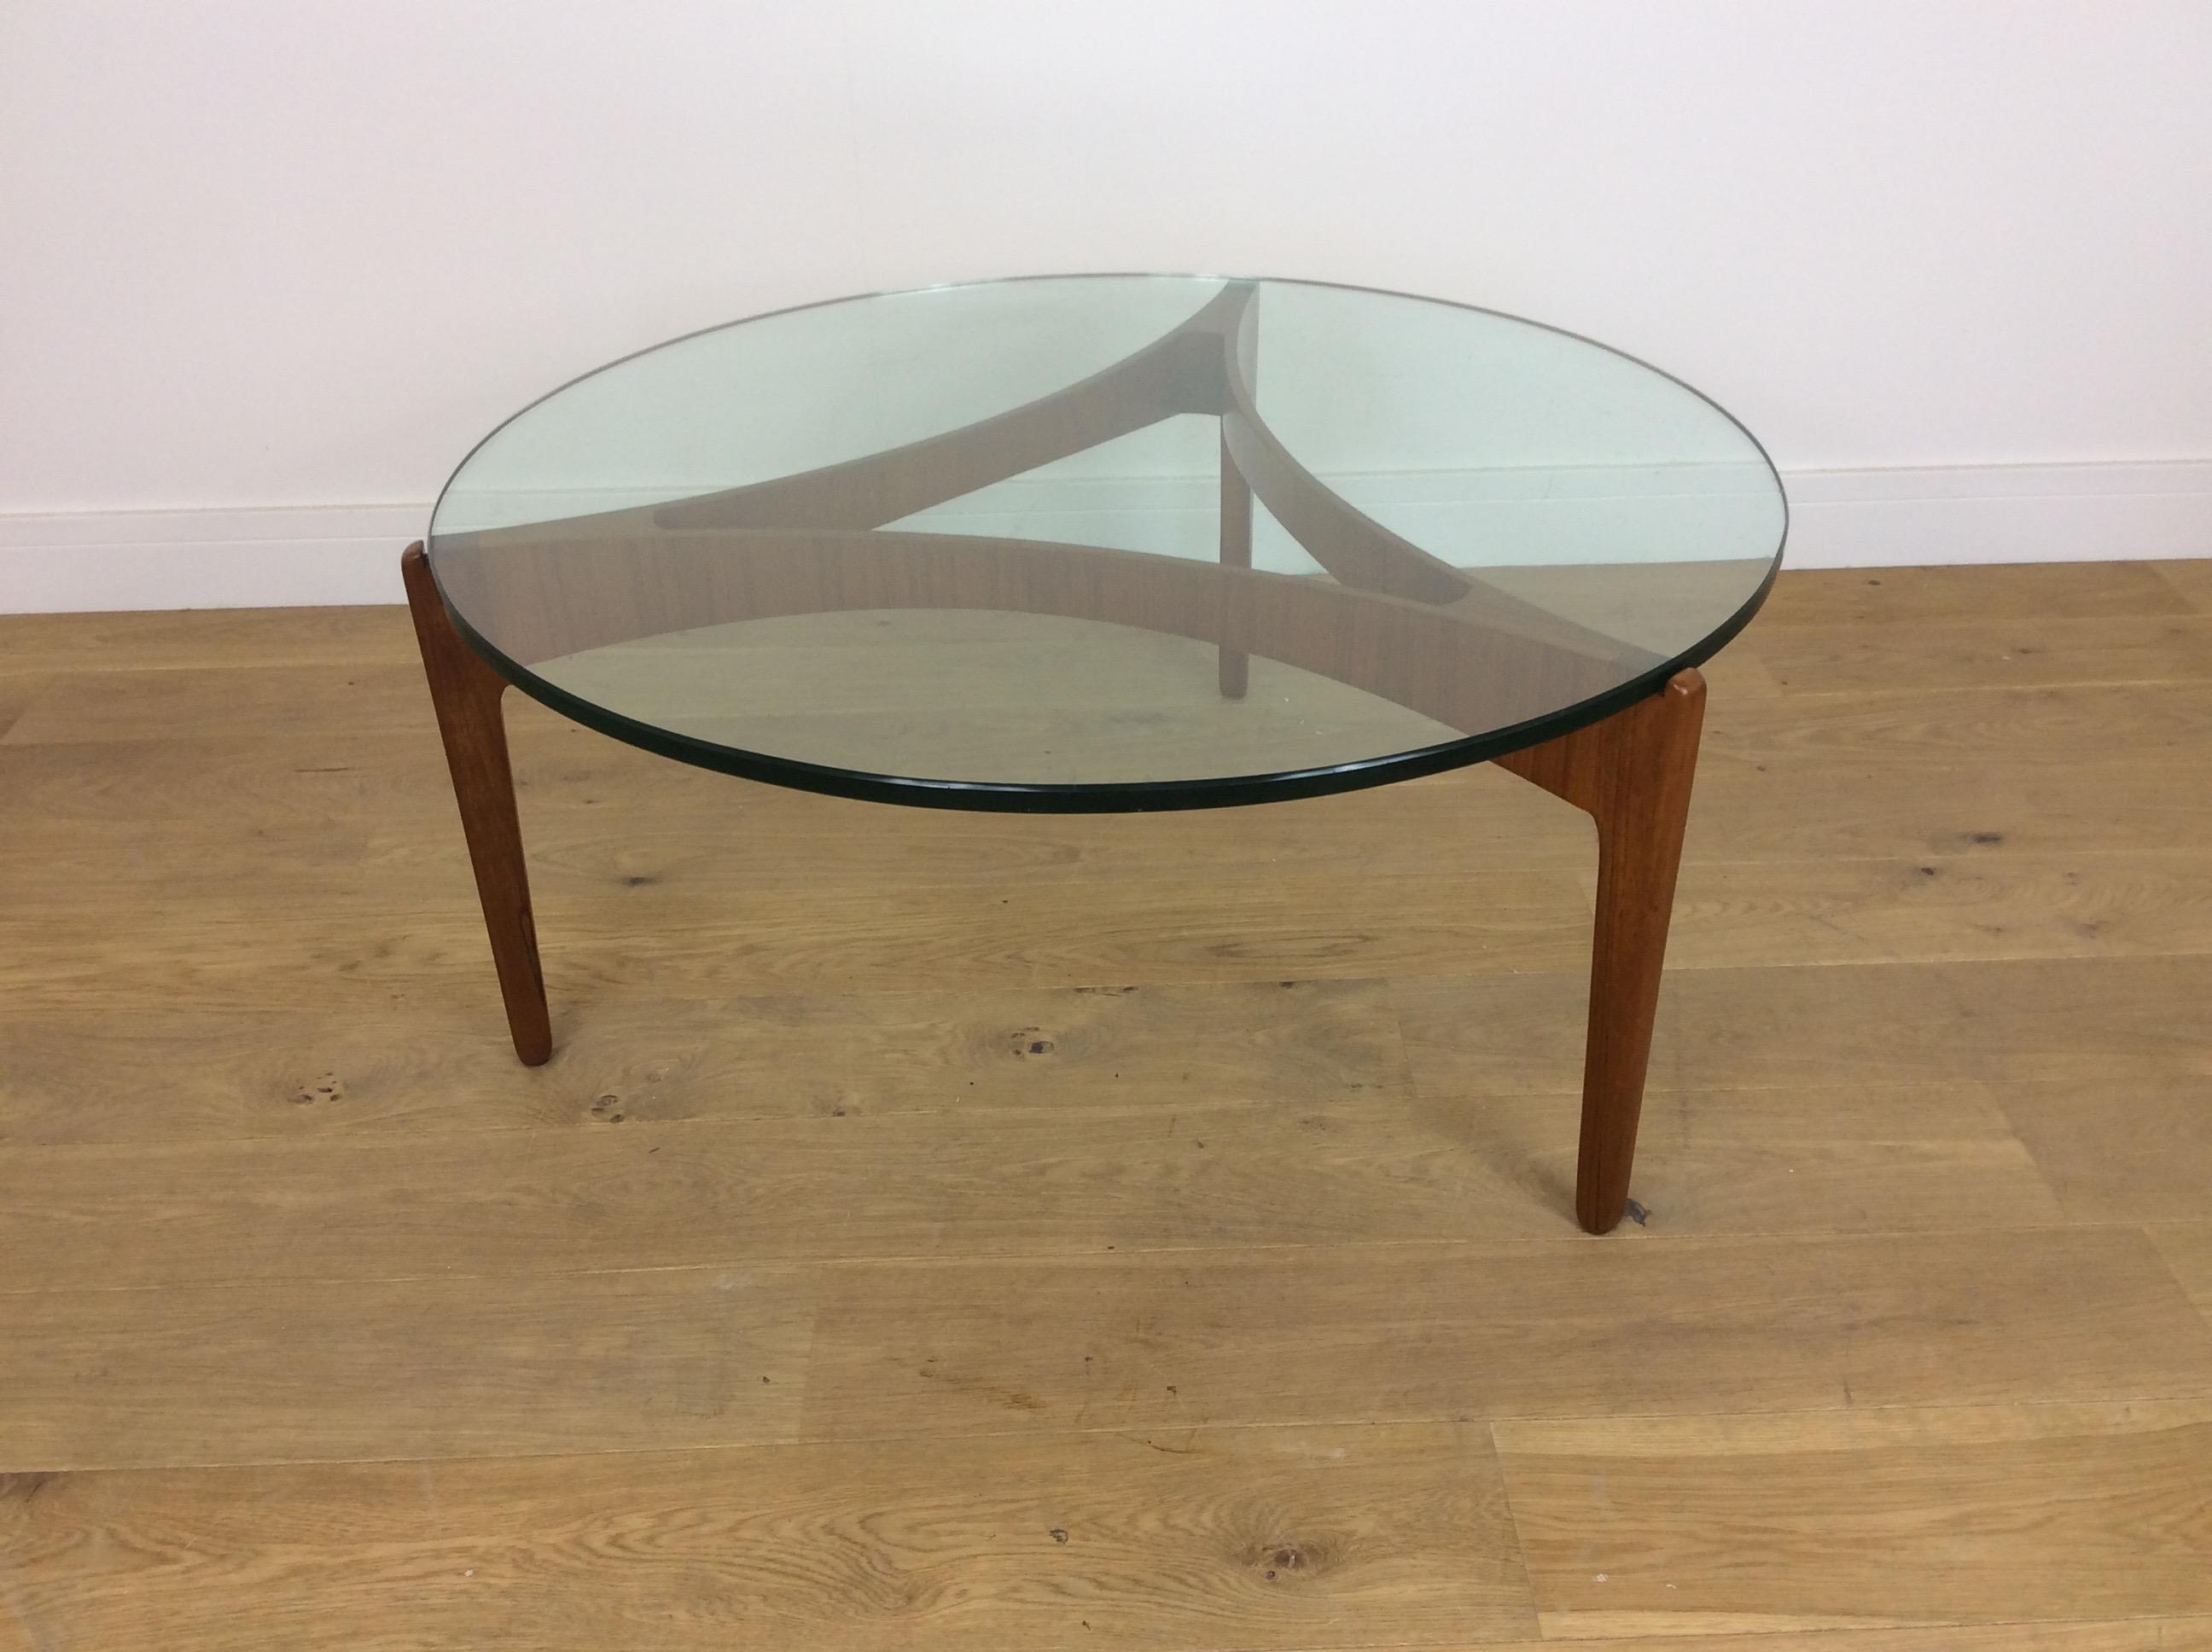 teak retro furniture. Mid Century Danish Teak And Glass Table By Sven Ellekaer Retro Furniture D